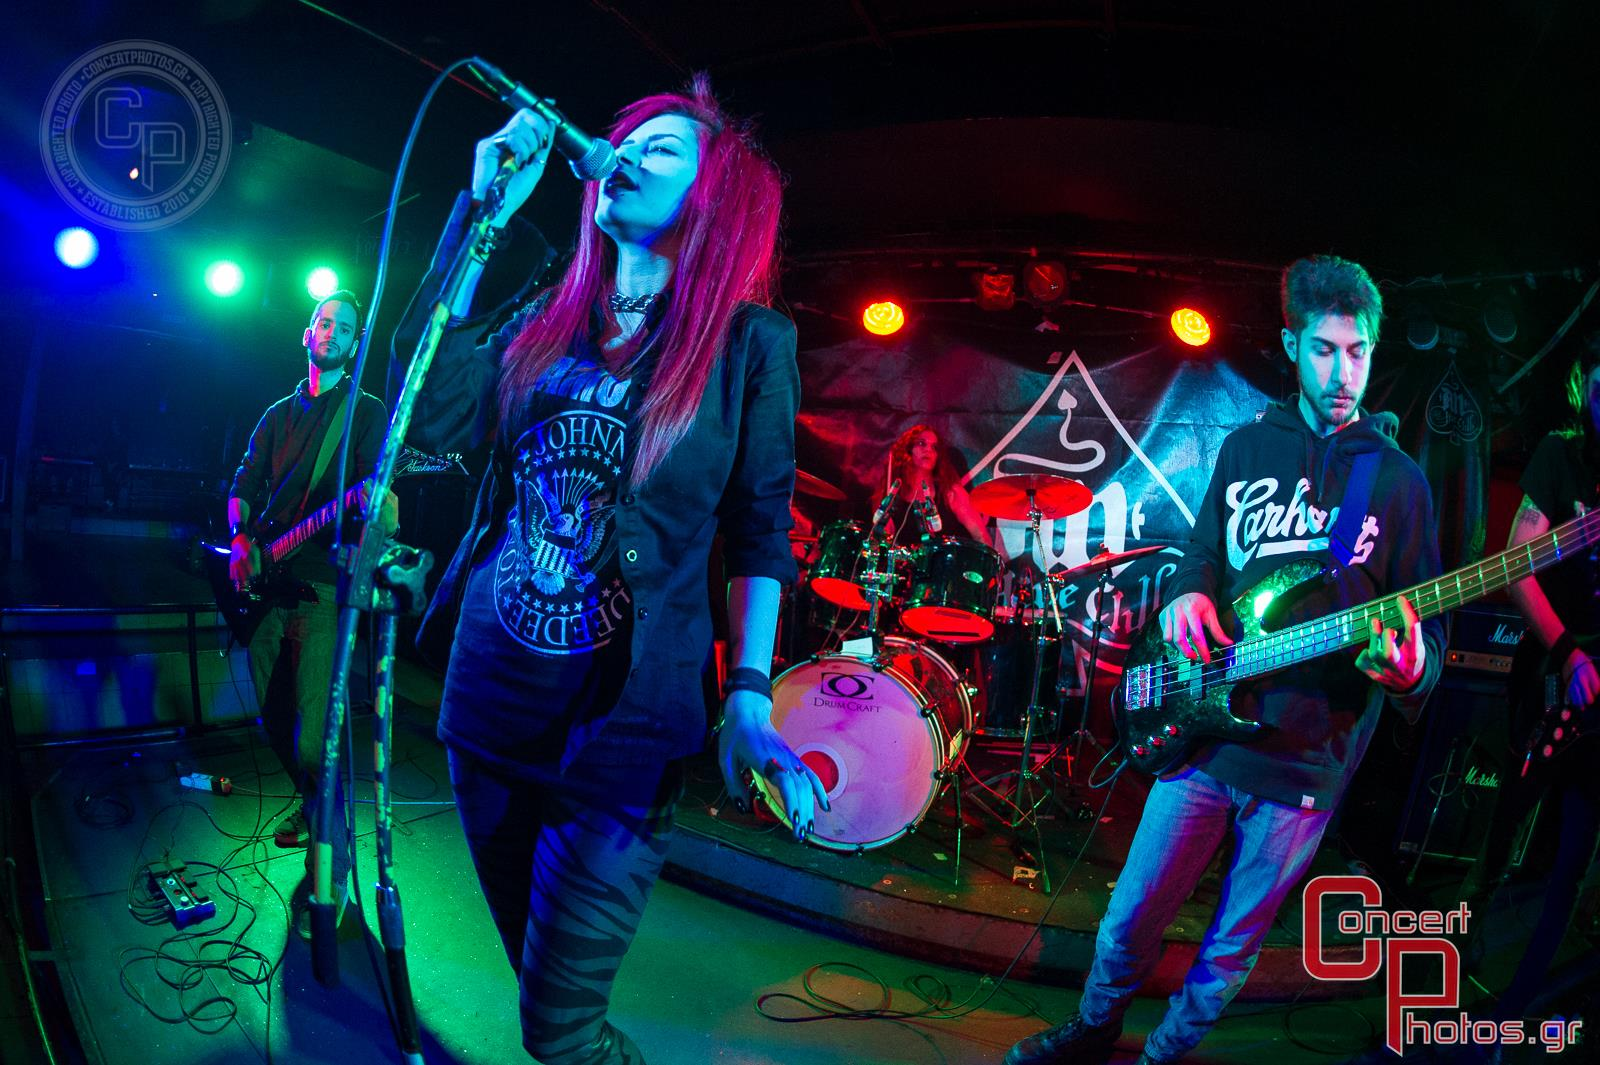 Battle Of The Bands Leg 1-Battle Of The Bands Leg 1 photographer:  - ConcertPhotos - 20141127_0013_47